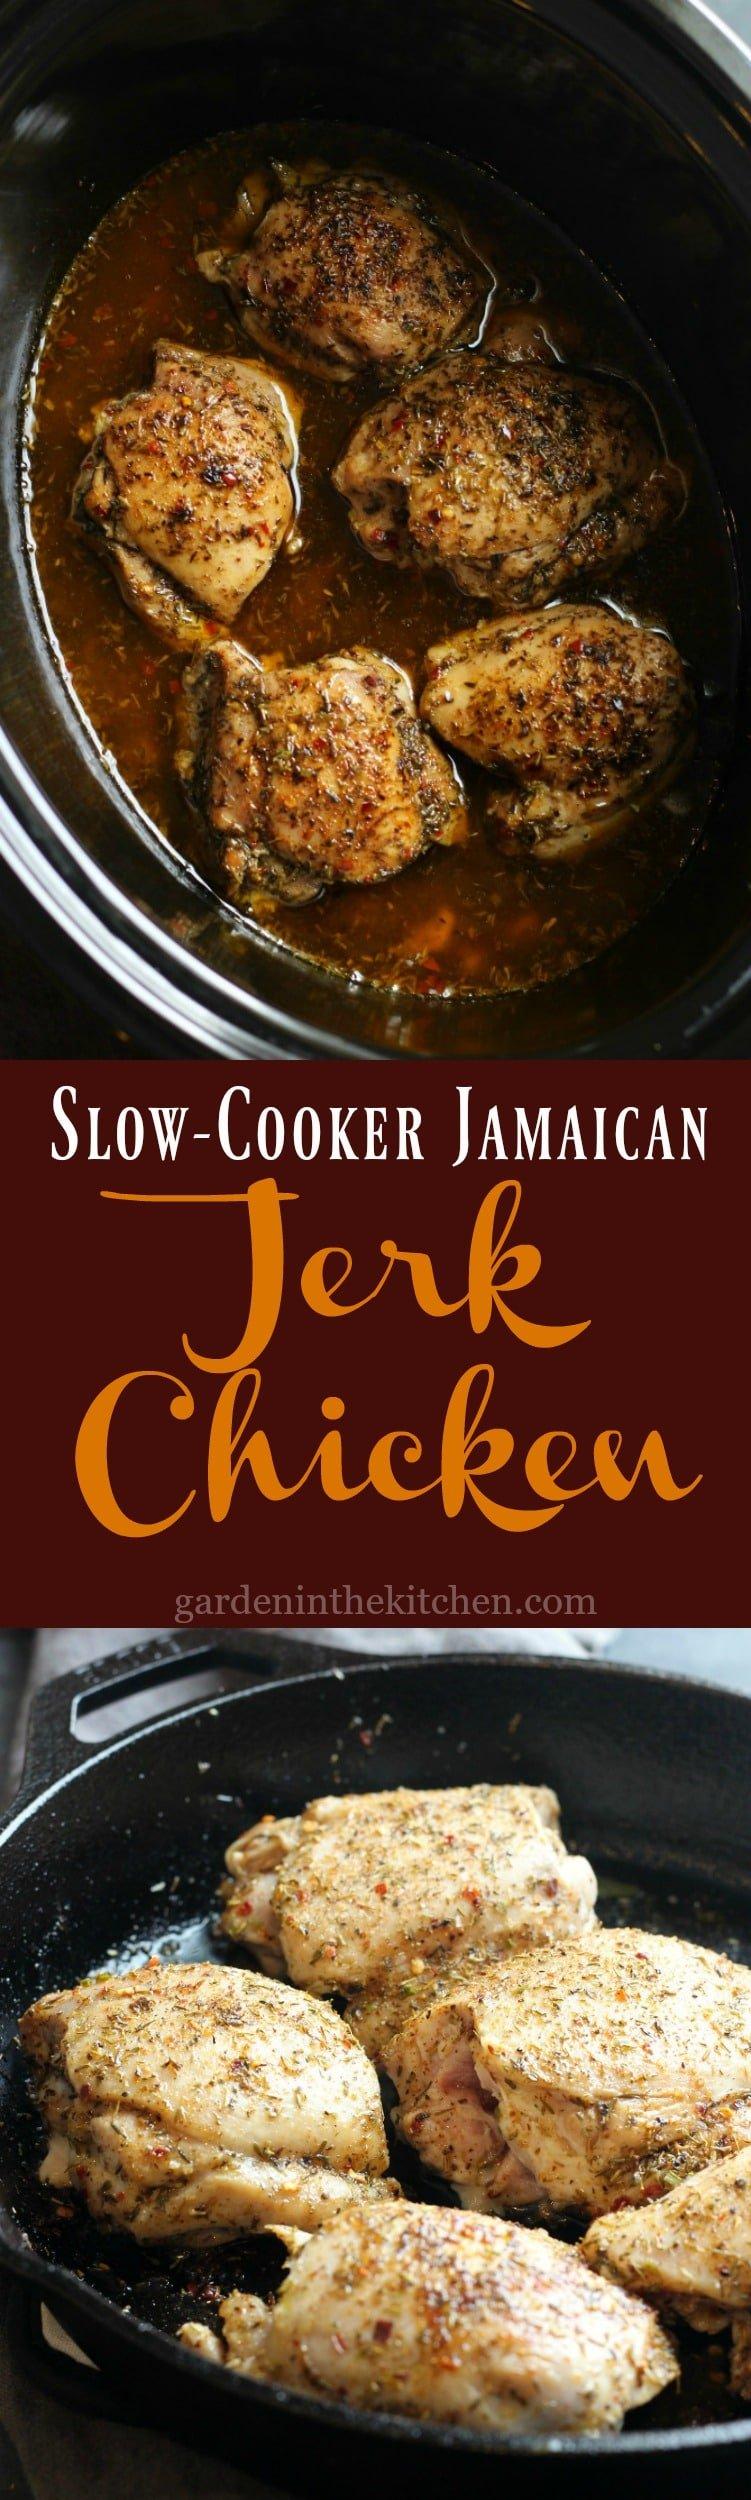 Slow Cooker Jamaican Jerk Chicken | gardeninthekitchen.com